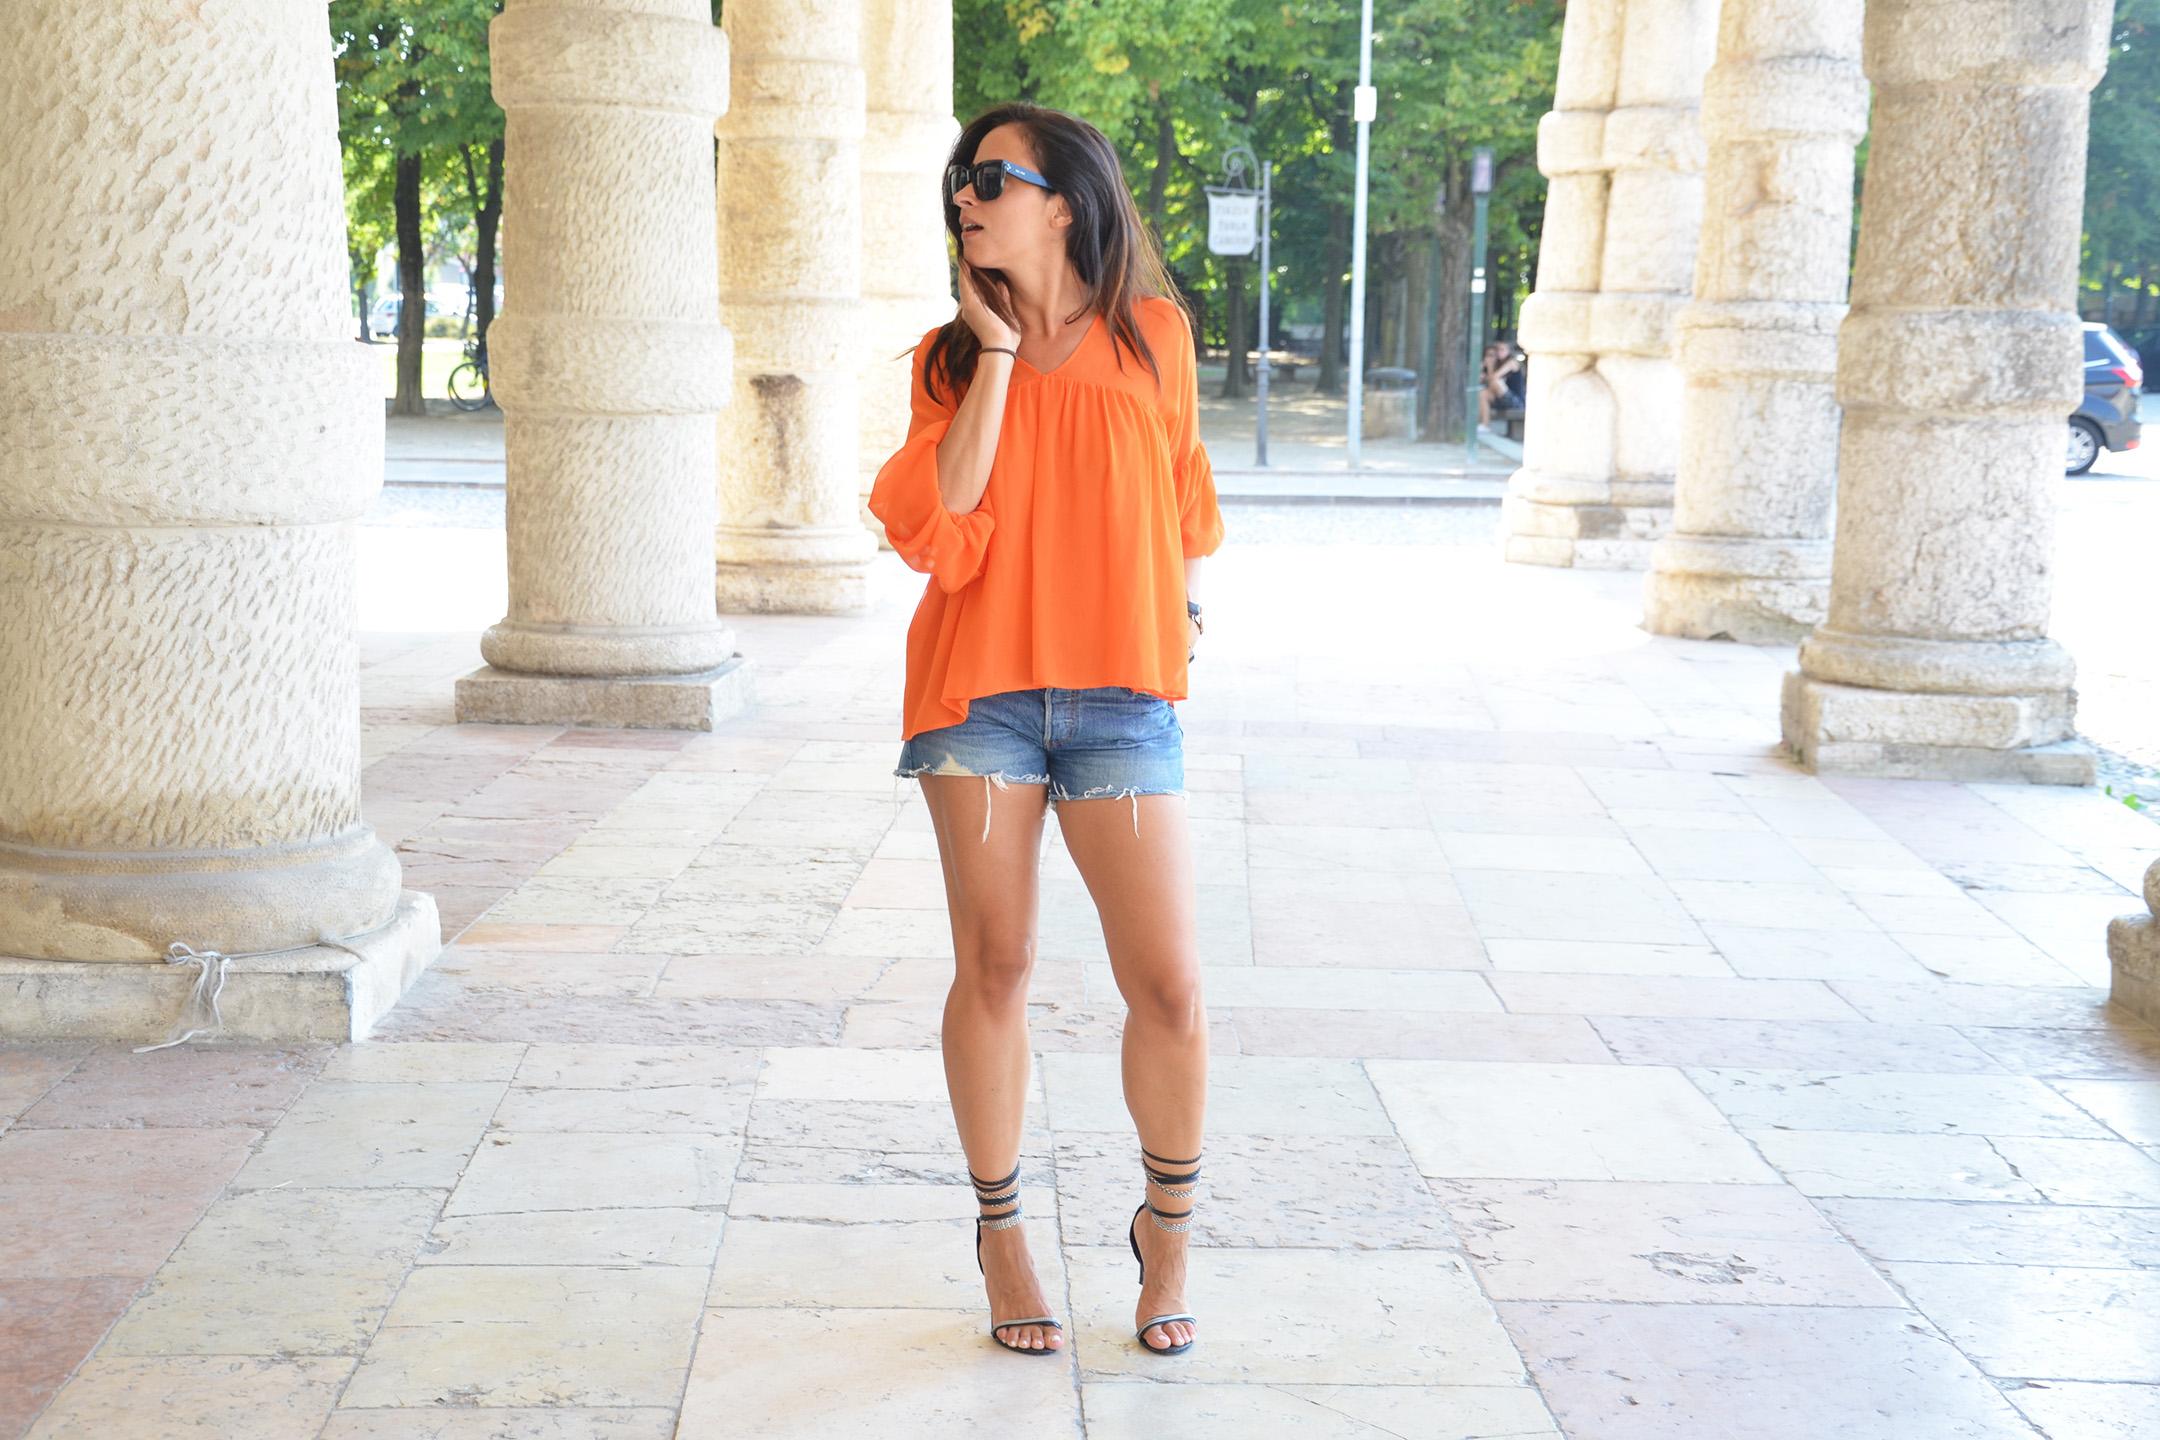 look-alessia-canella-shorts-blusa-arancio-jeans-outfit